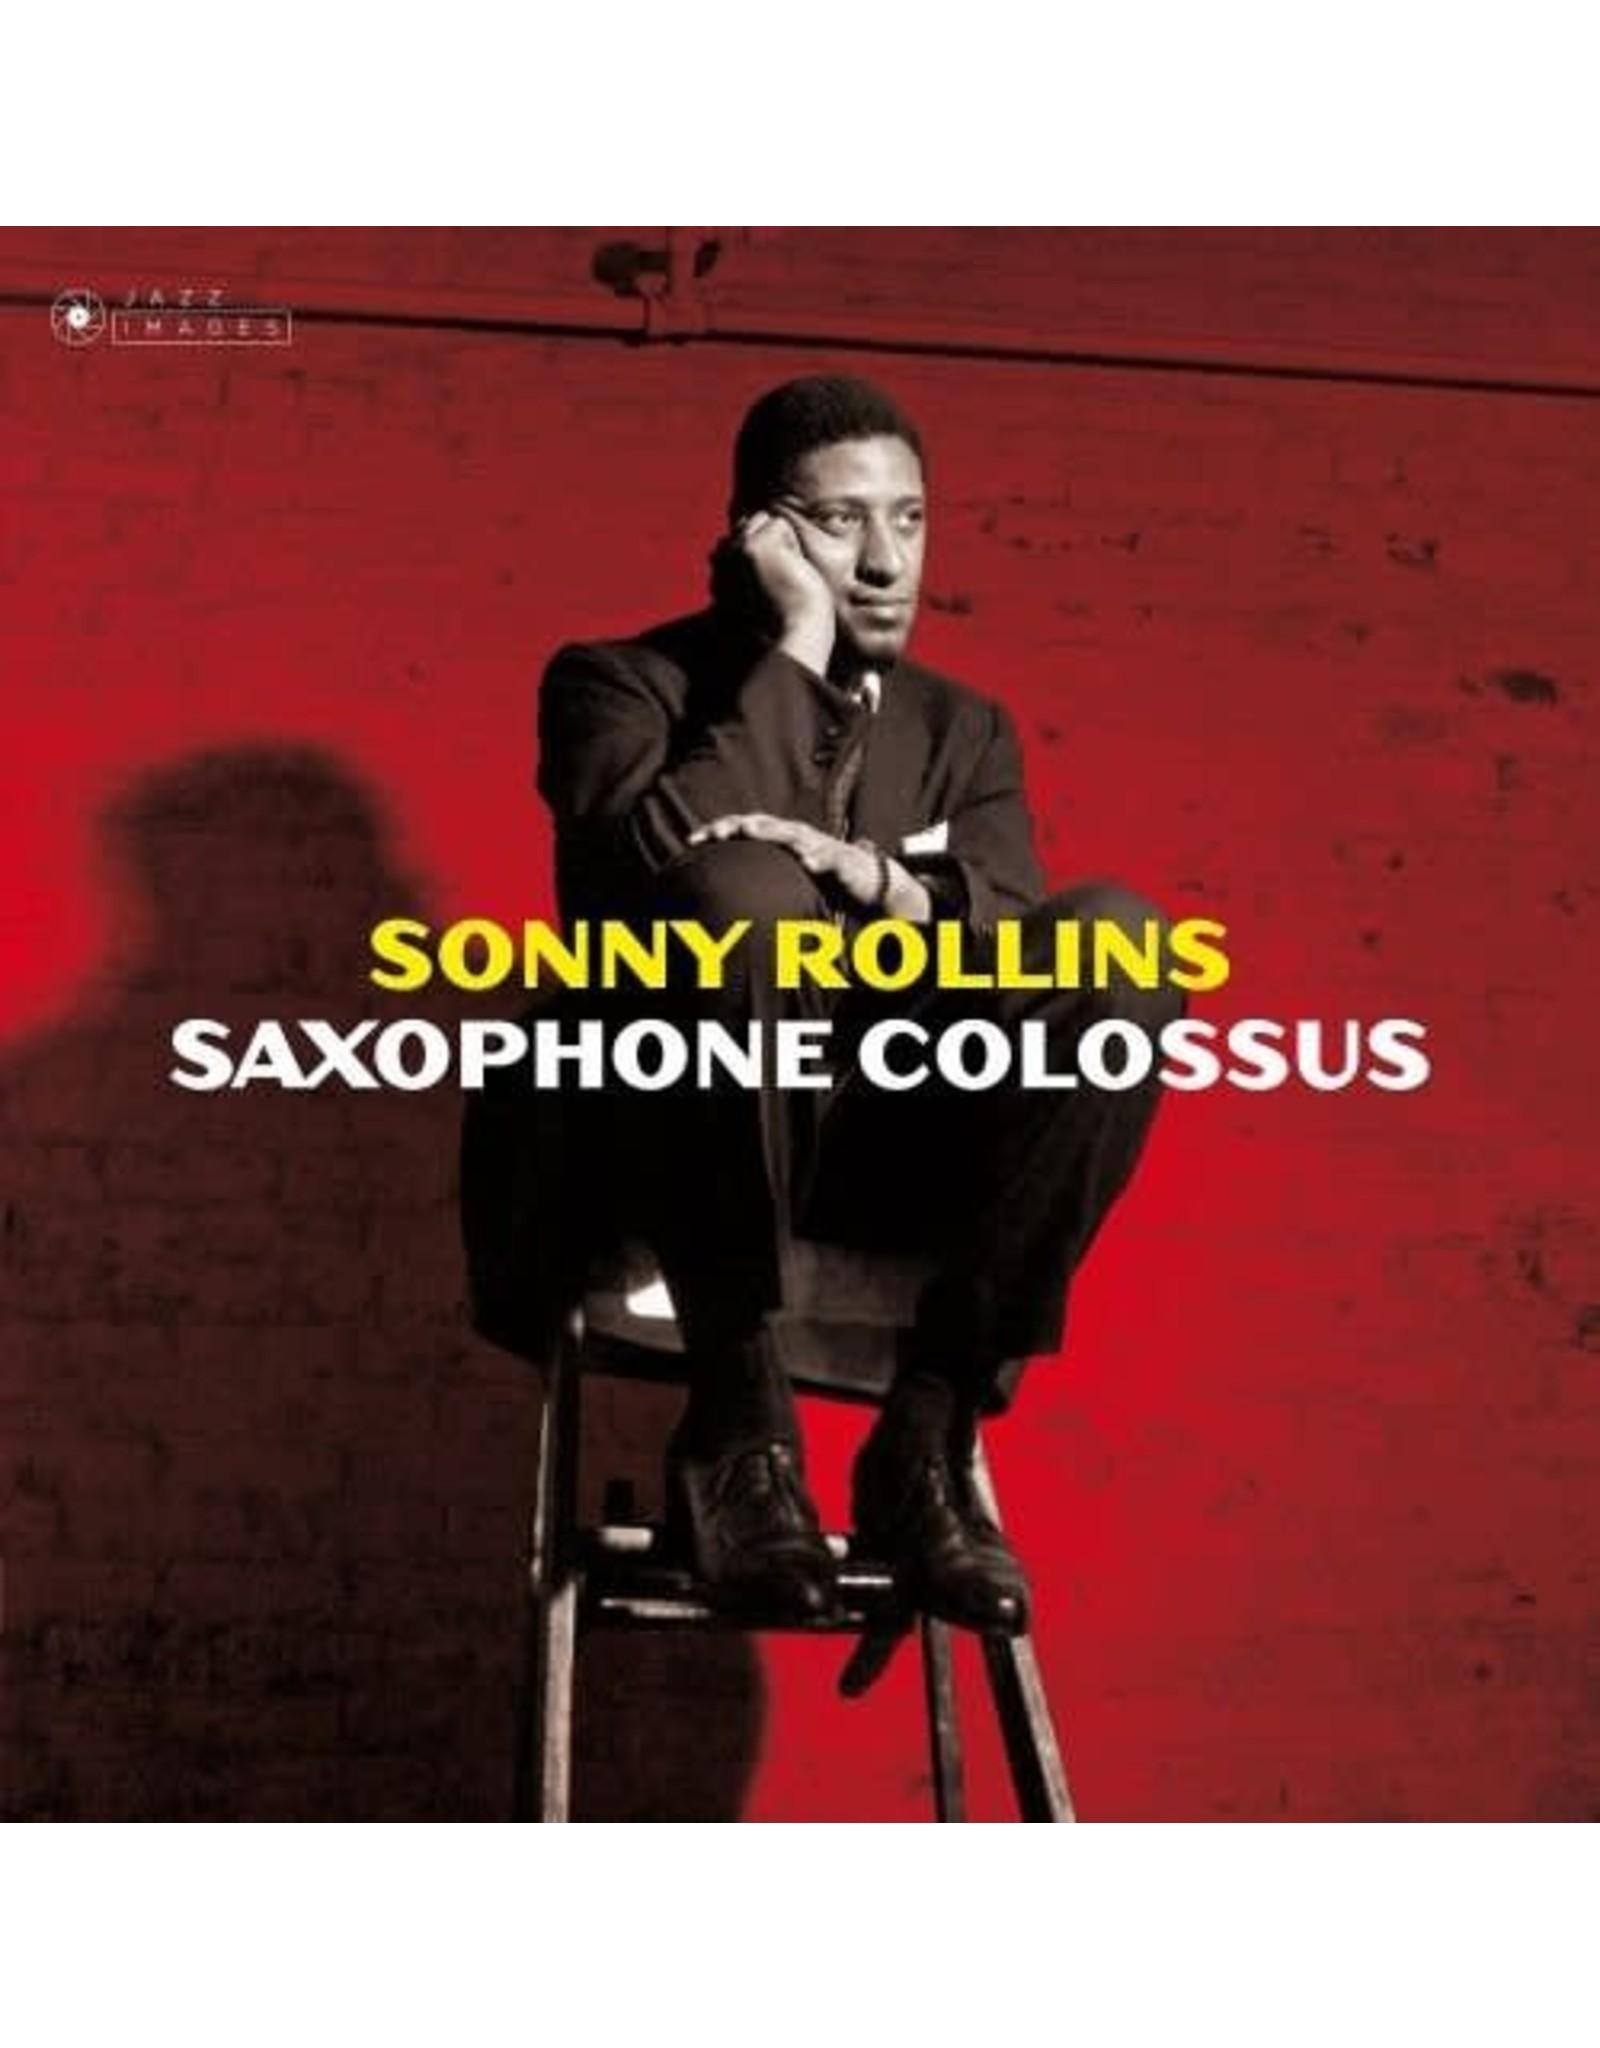 New Vinyl Sonny Rollins - Saxophone Colossus LP